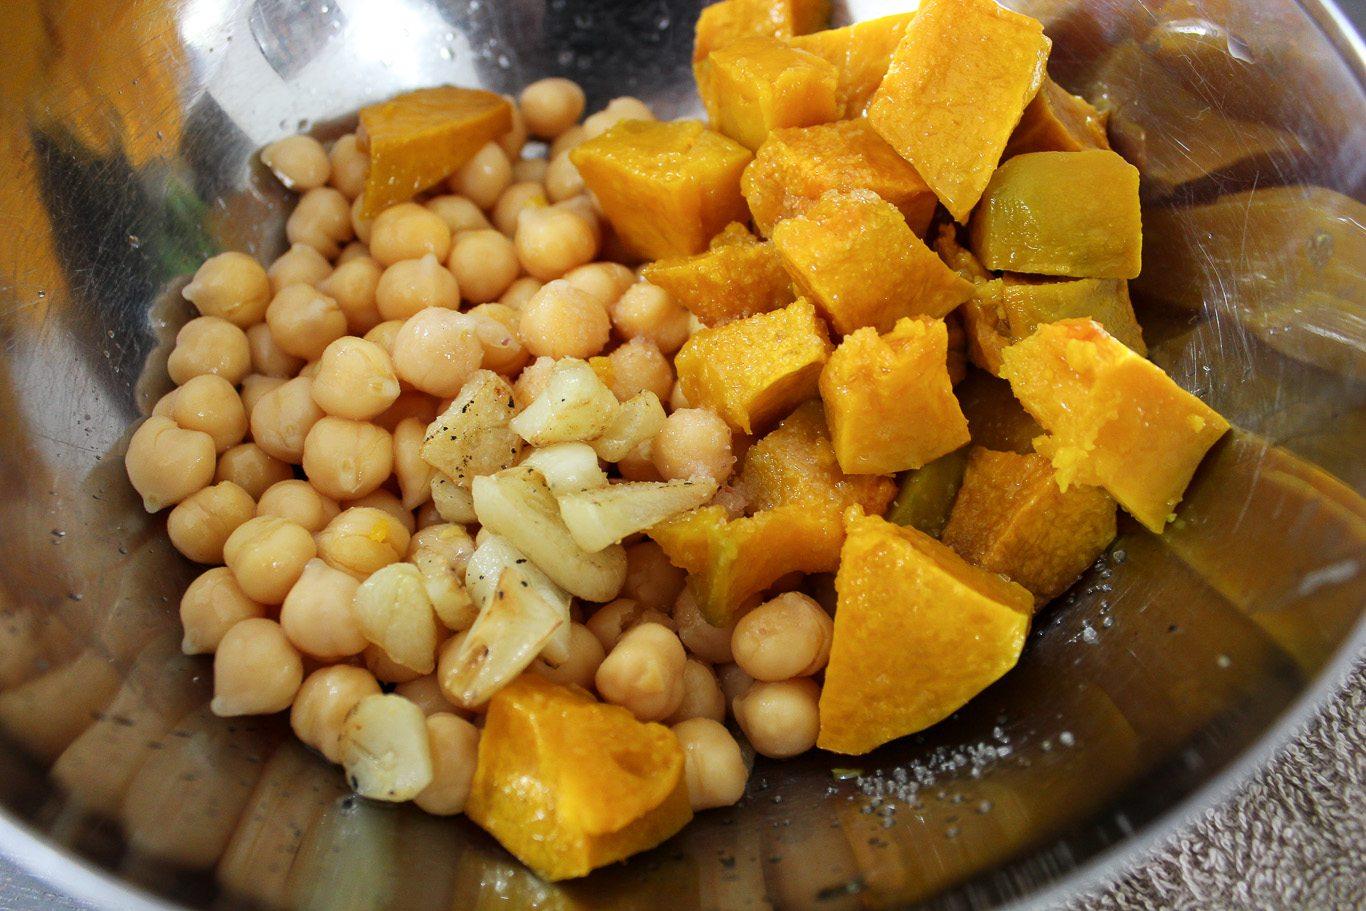 Roasted Garlic and Pumpkin Hummus